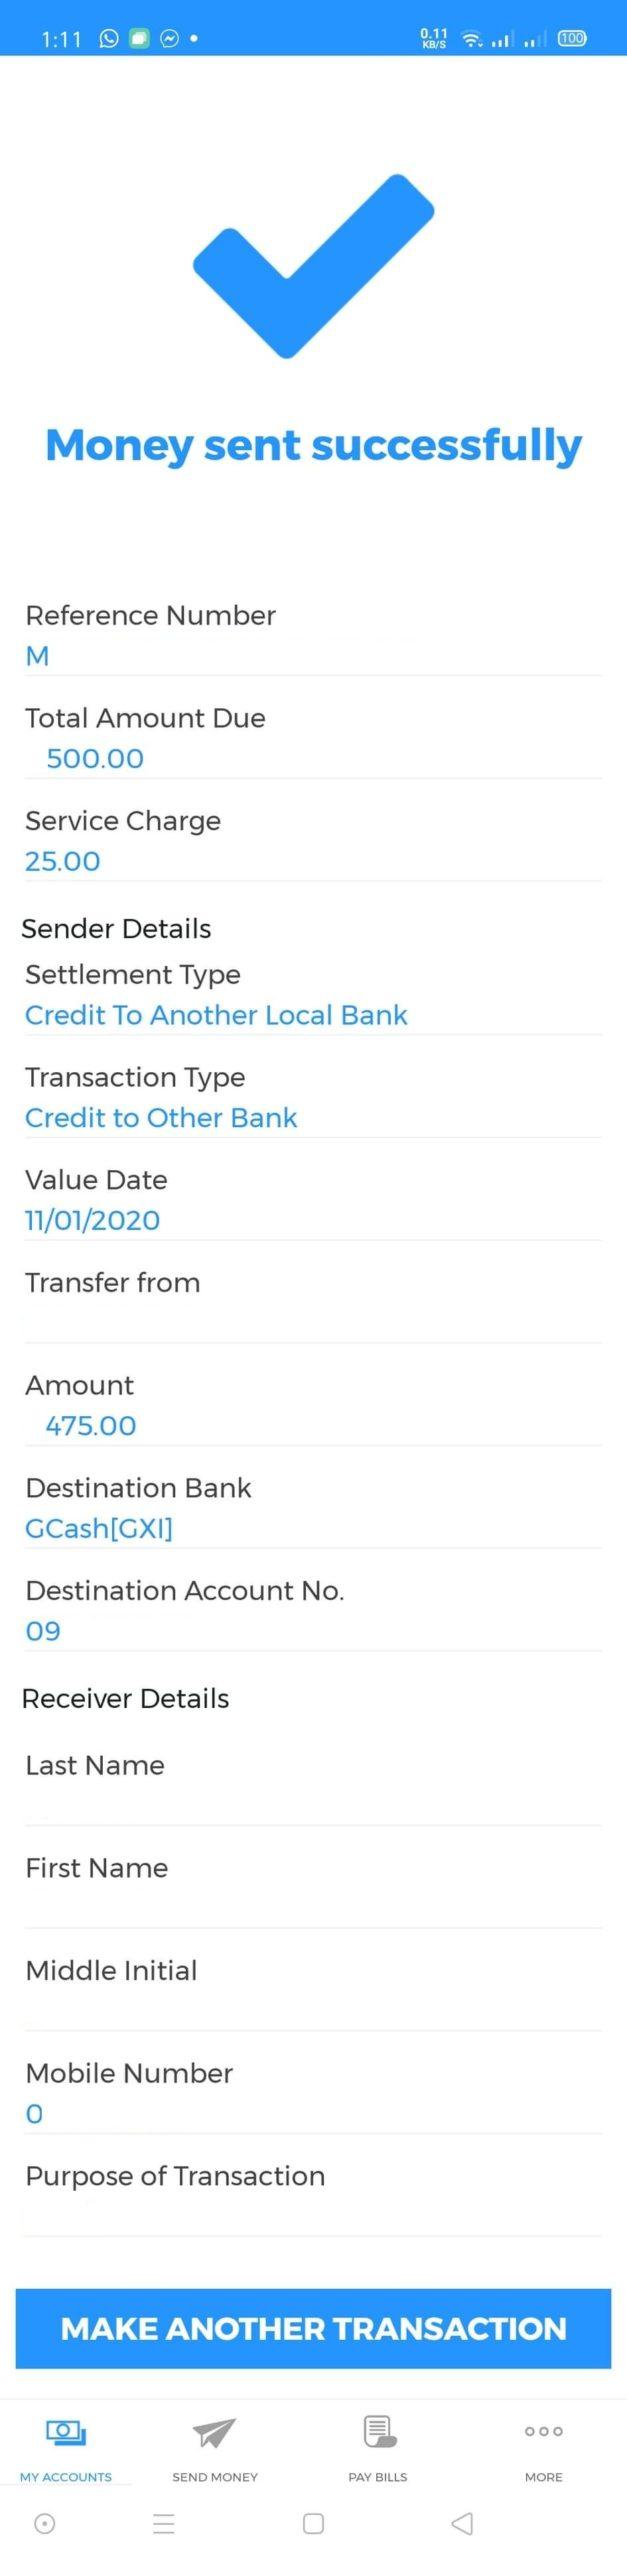 BDO to GCash (Transferring Money from your Banco De Oro Bank Account to GCash) 06